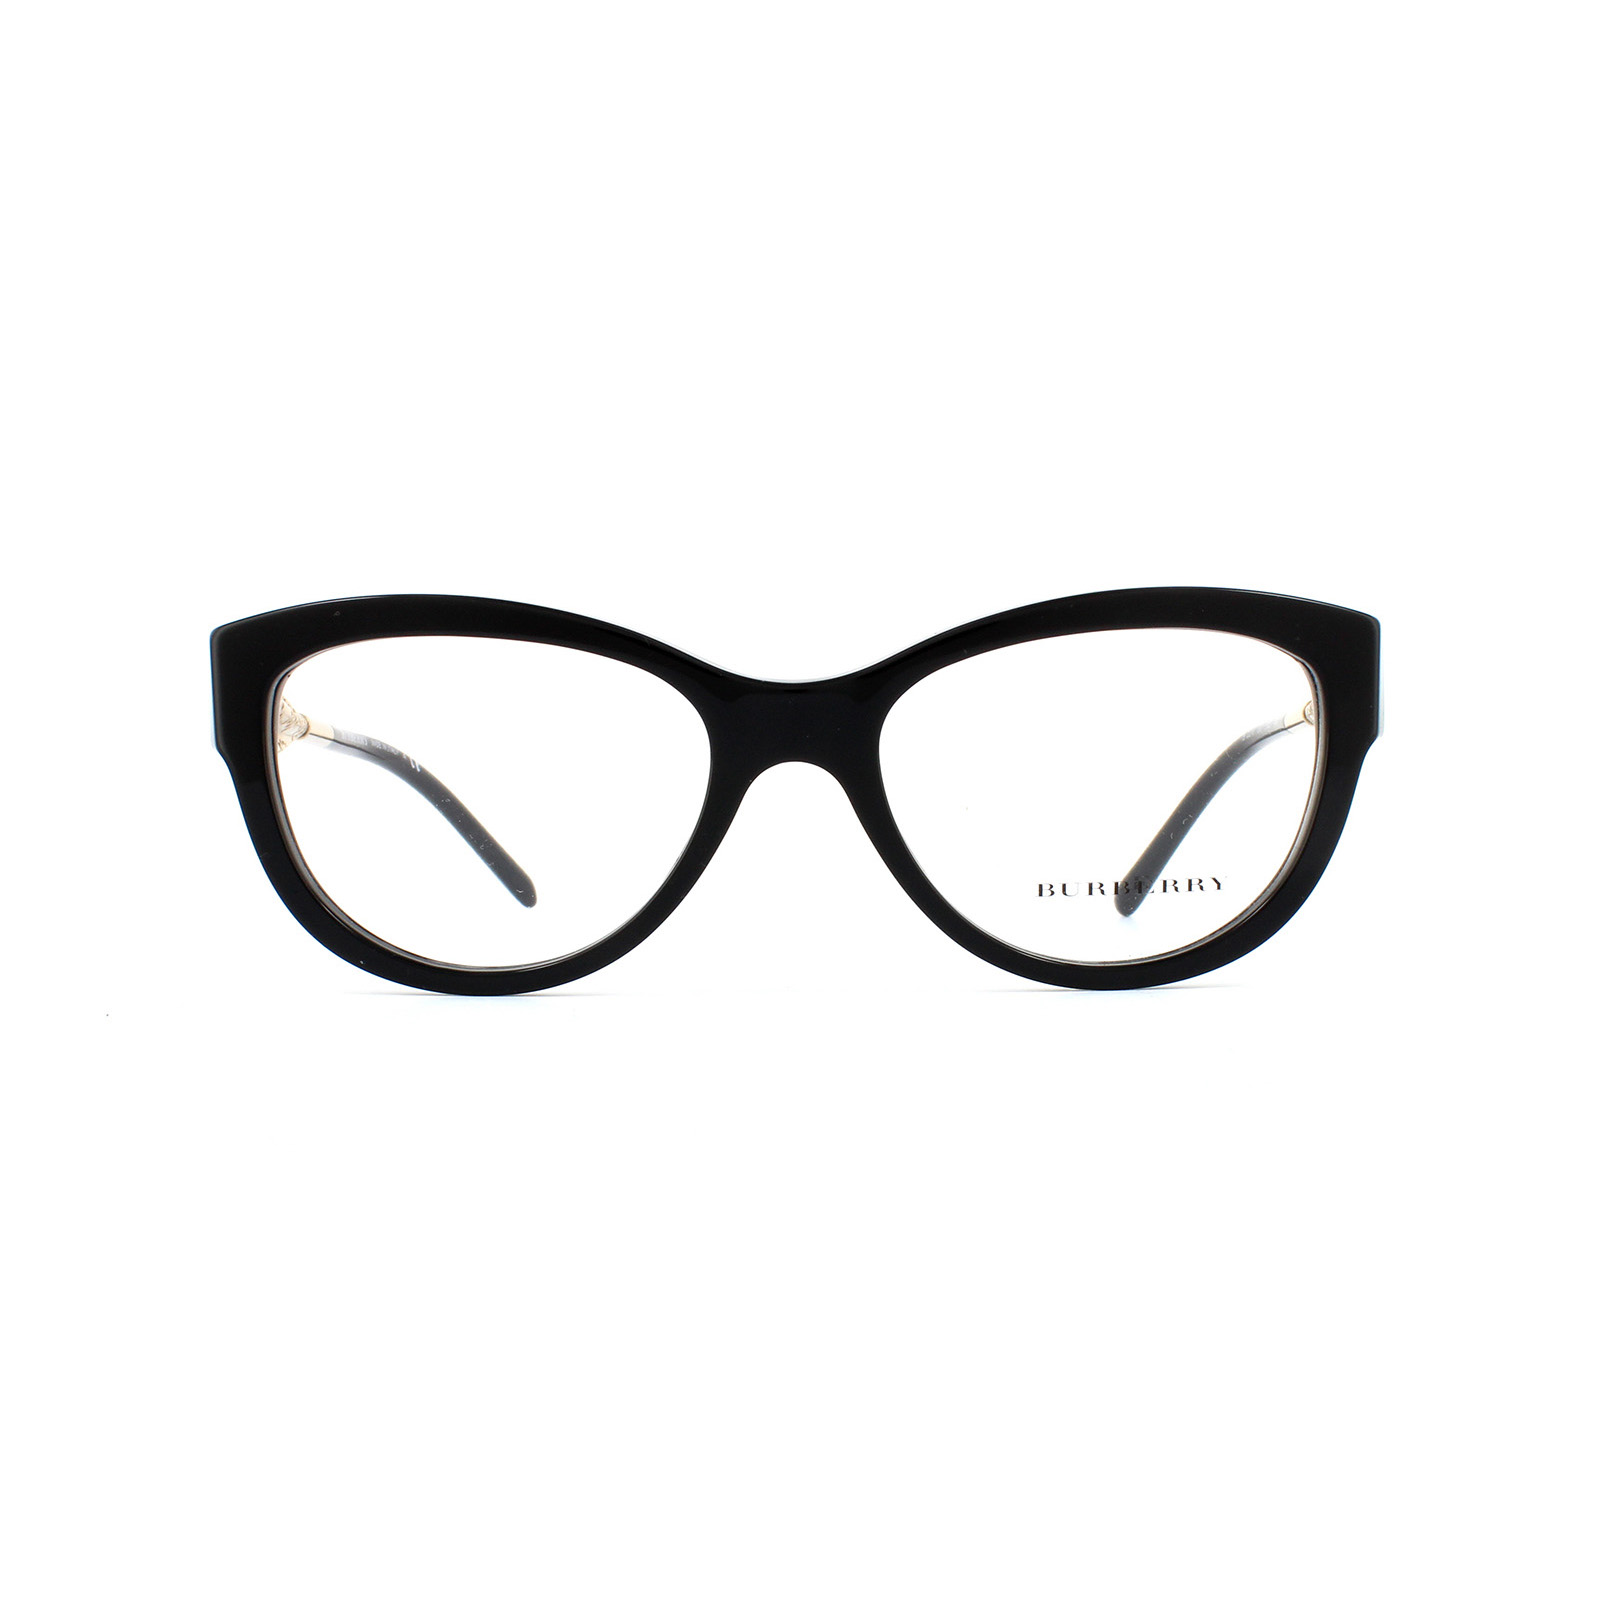 6120d5ca6c87 Sentinel Burberry Glasses Frames 2210 3001 Black Womens 53mm